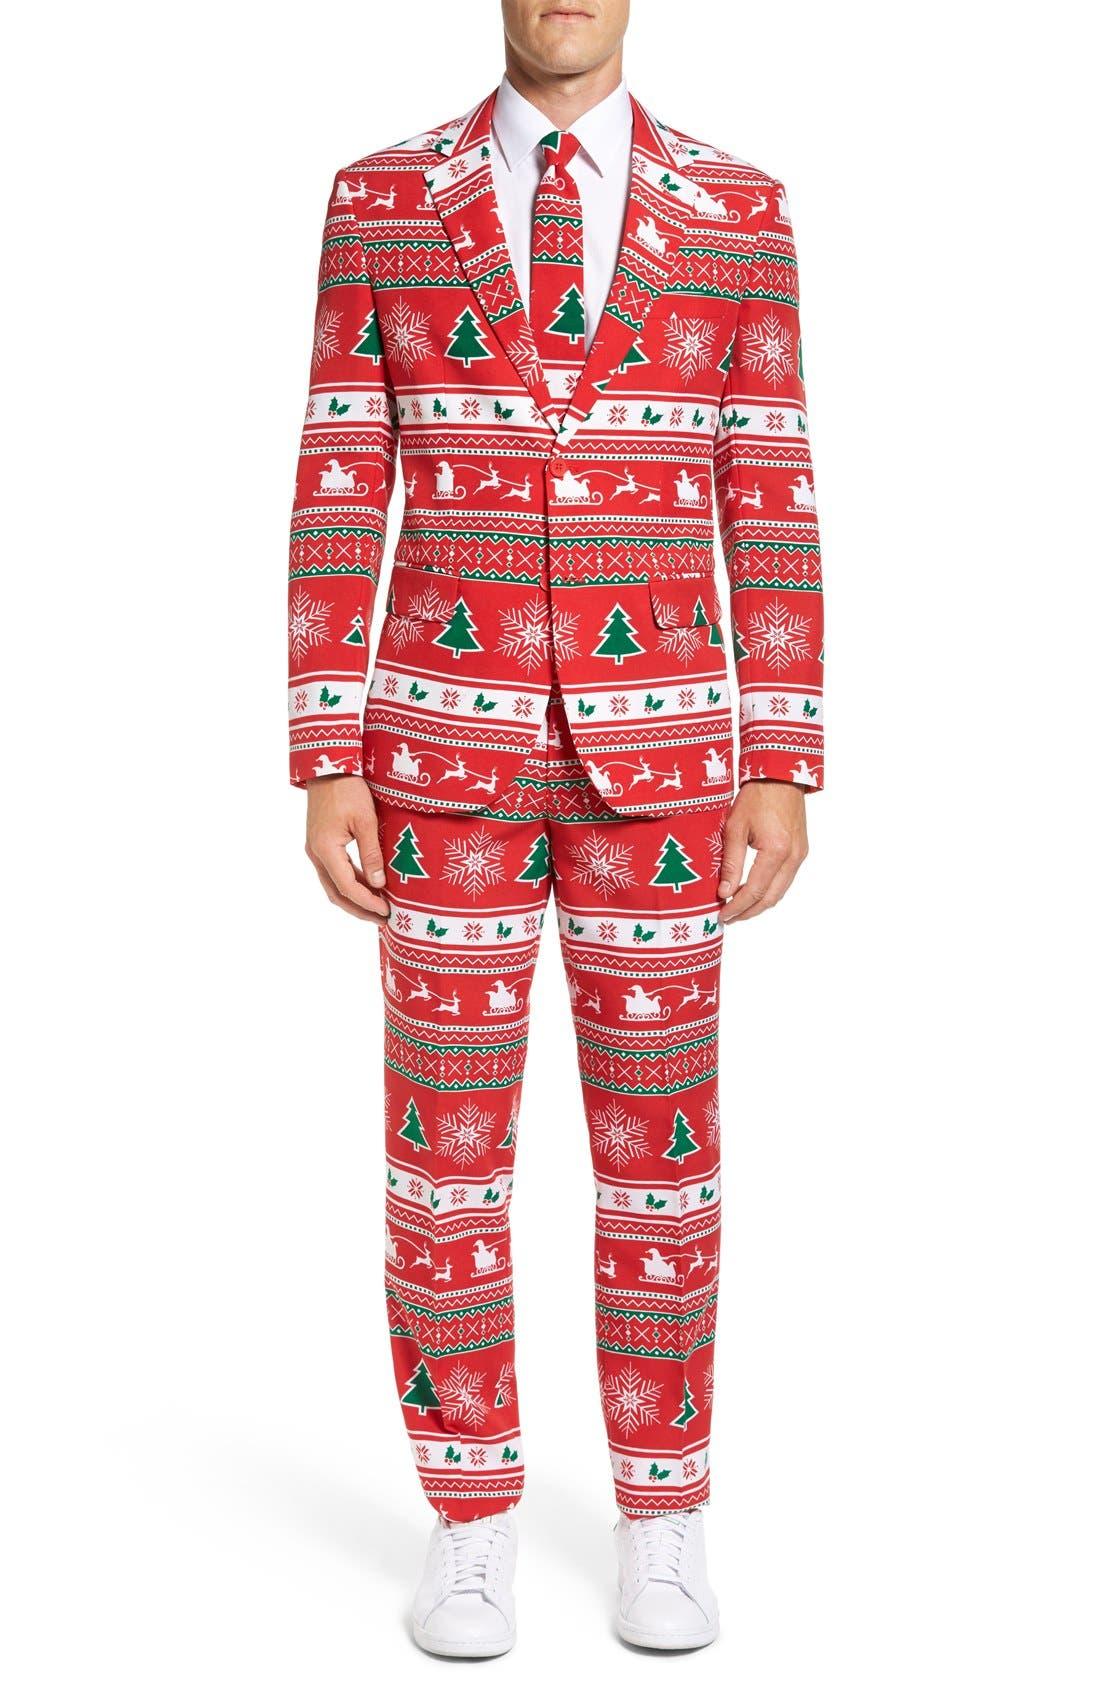 OppoSuits 'Winter Wonderland' Trim Fit Two-Piece Suit with Tie